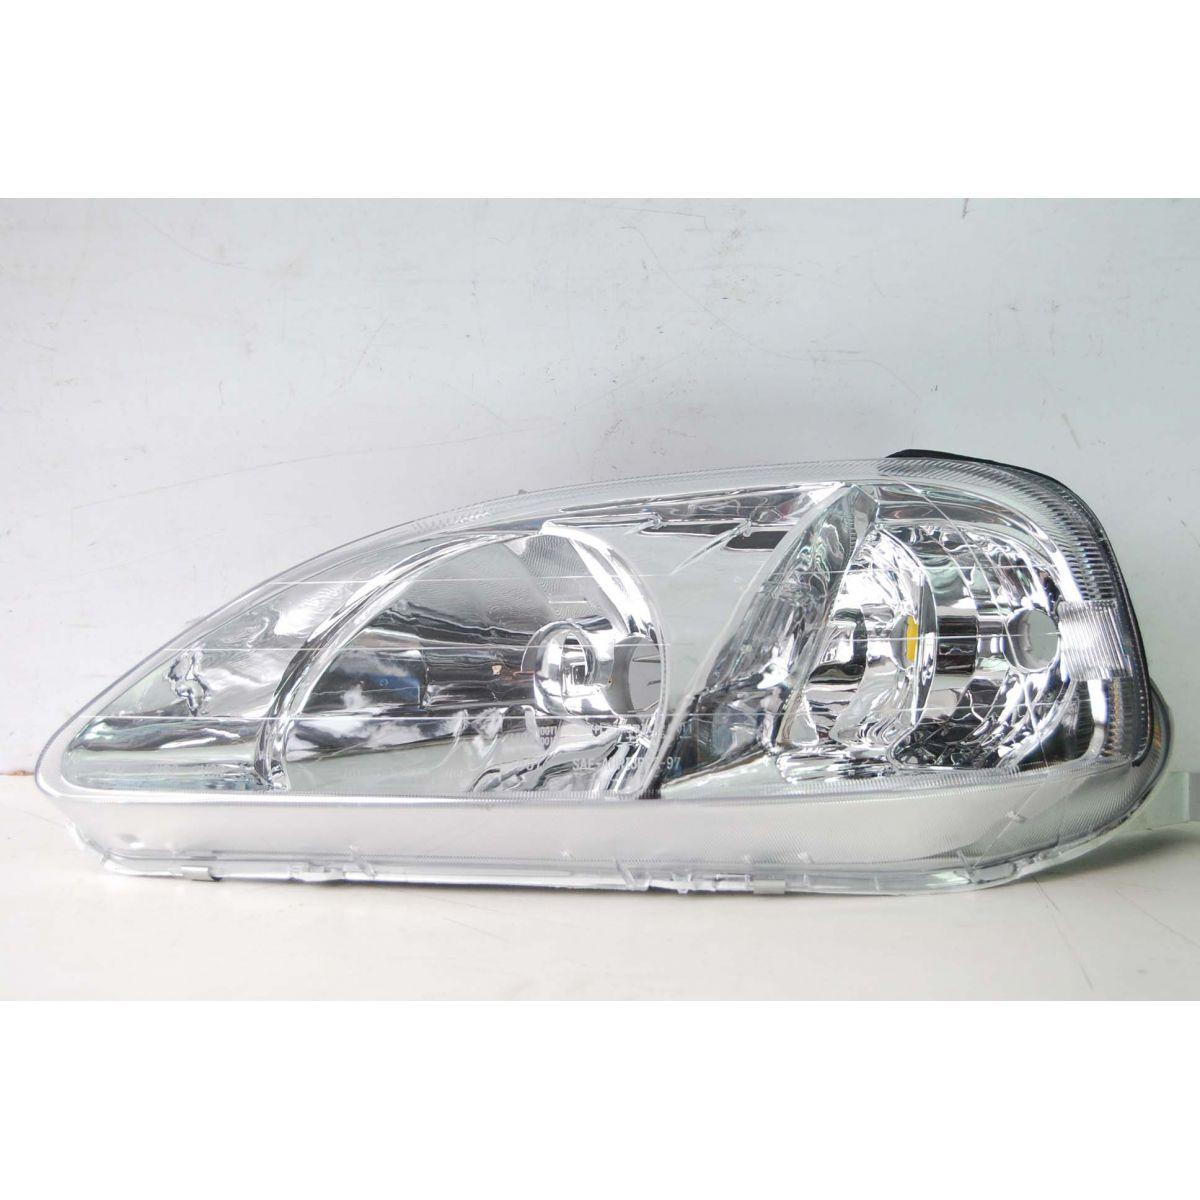 Farol Honda Civic 98 a 00 Novo  - Amd Auto Pe�as